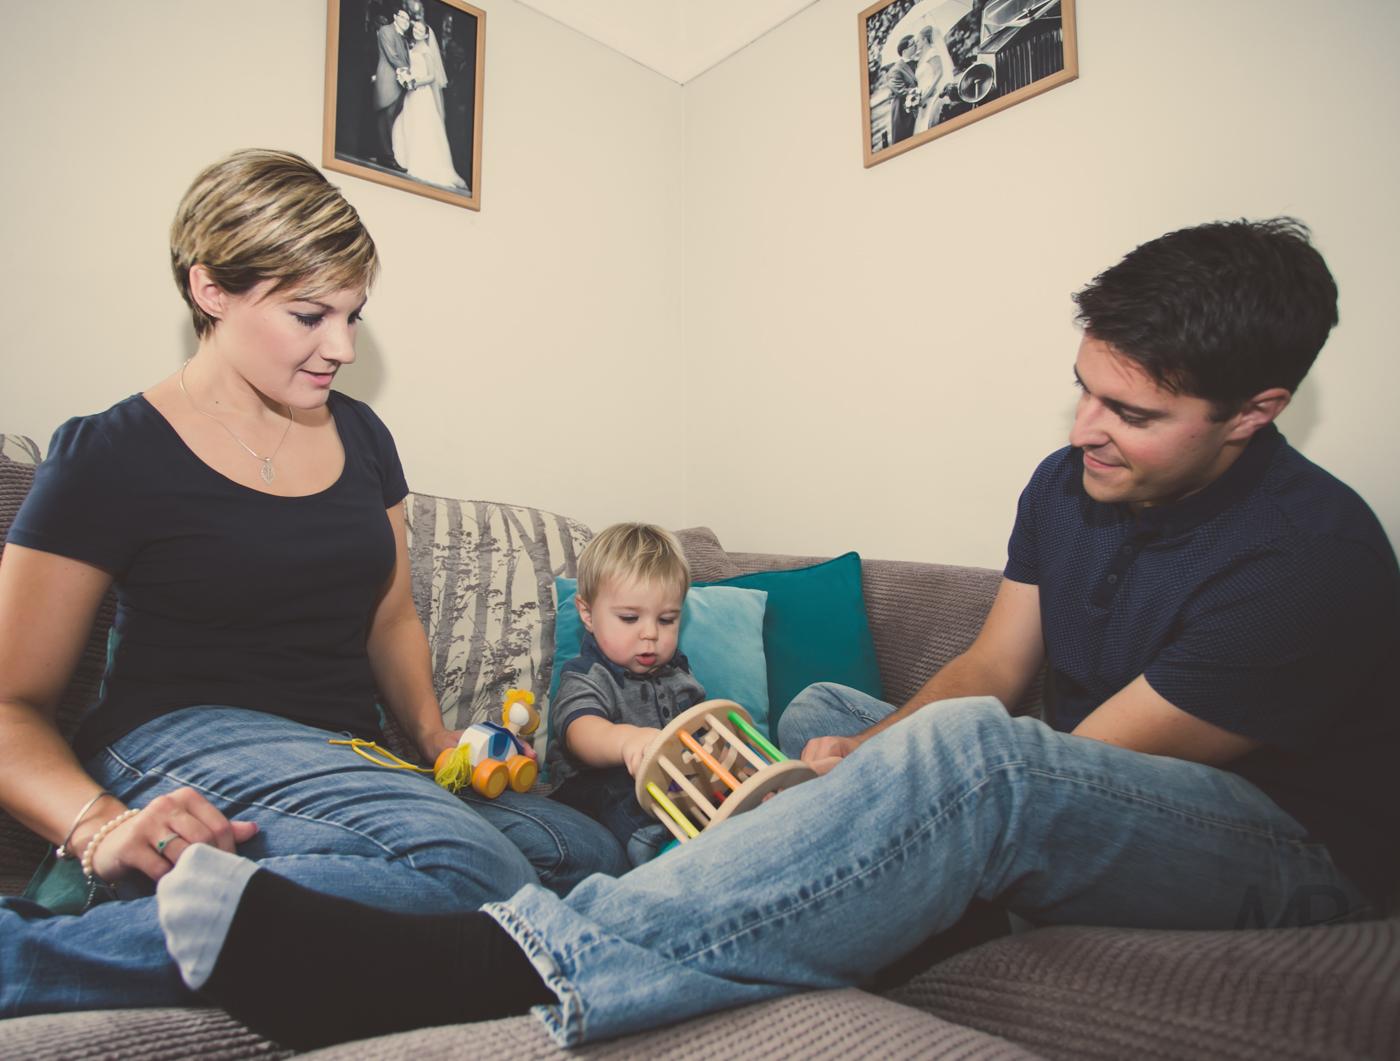 006 - Kelly, Matthew and Hugo Fine Art Family Photography by www.mpmedia.co.uk -54.JPG